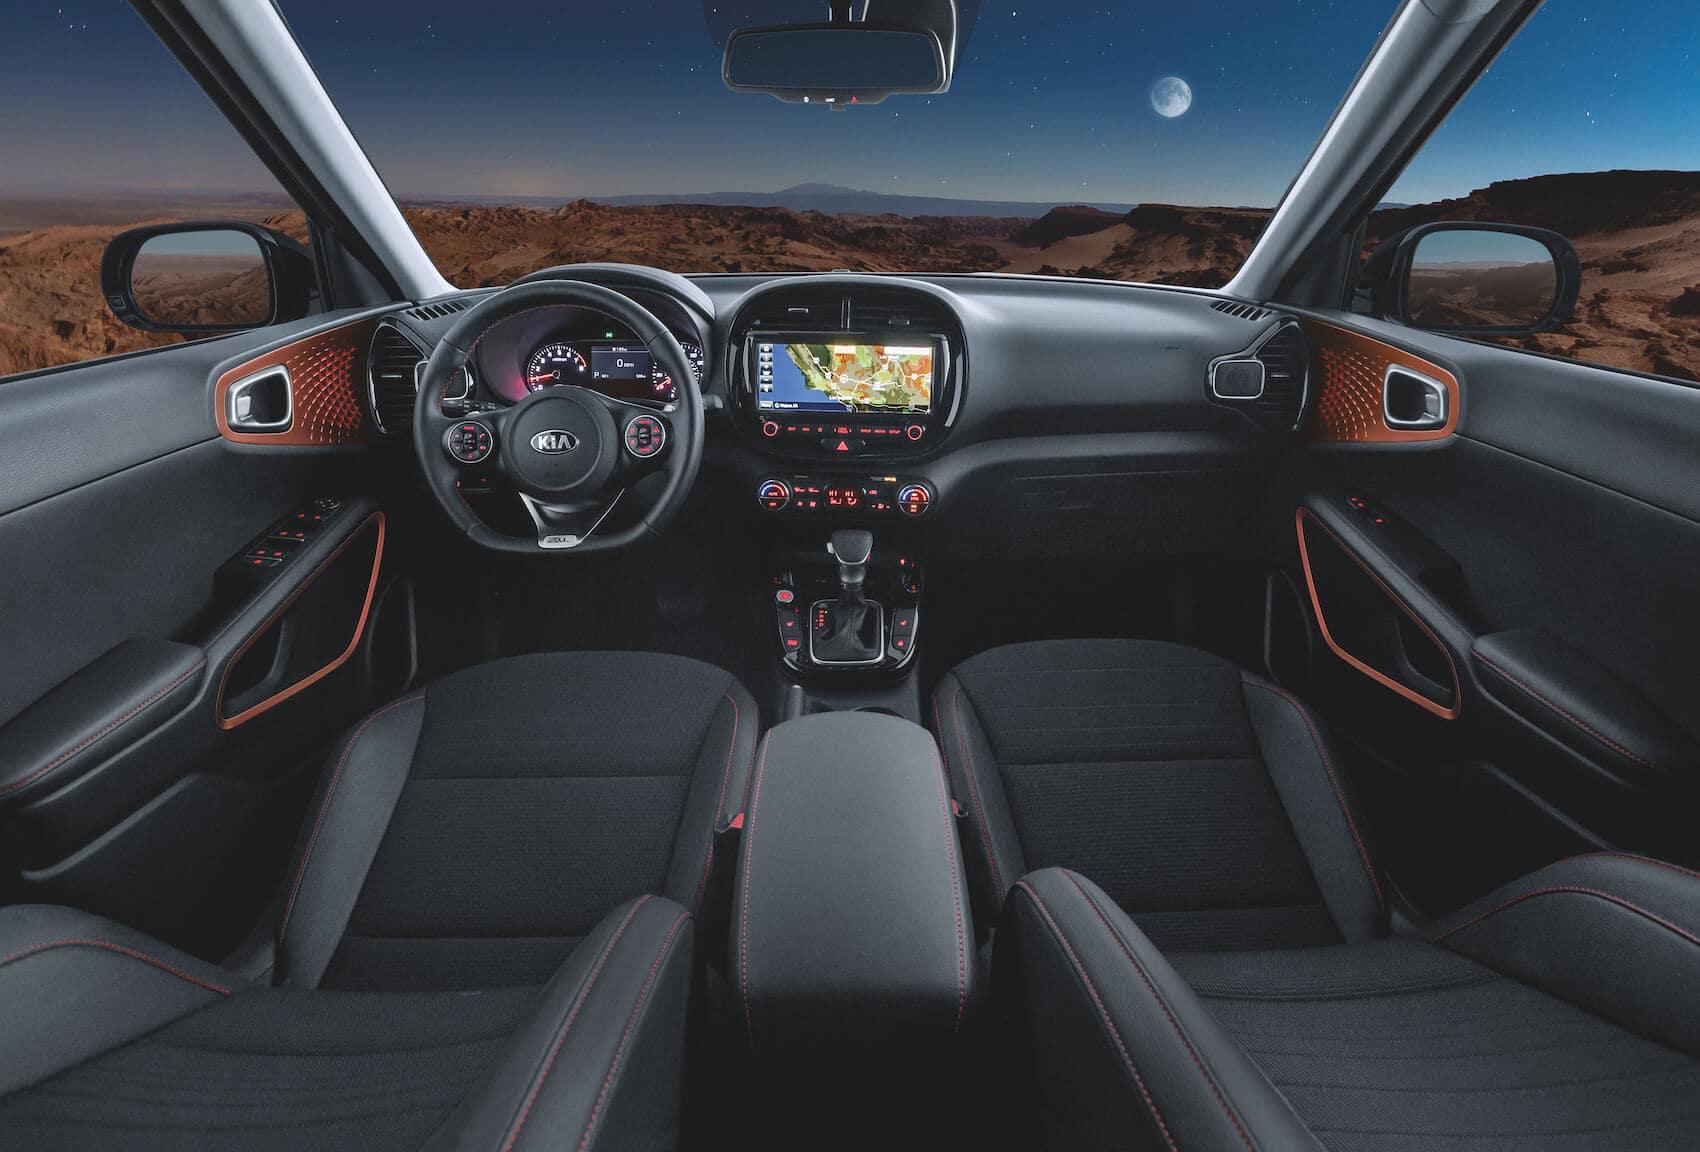 Kia Soul Interior Technology: Standard Entertainment Features